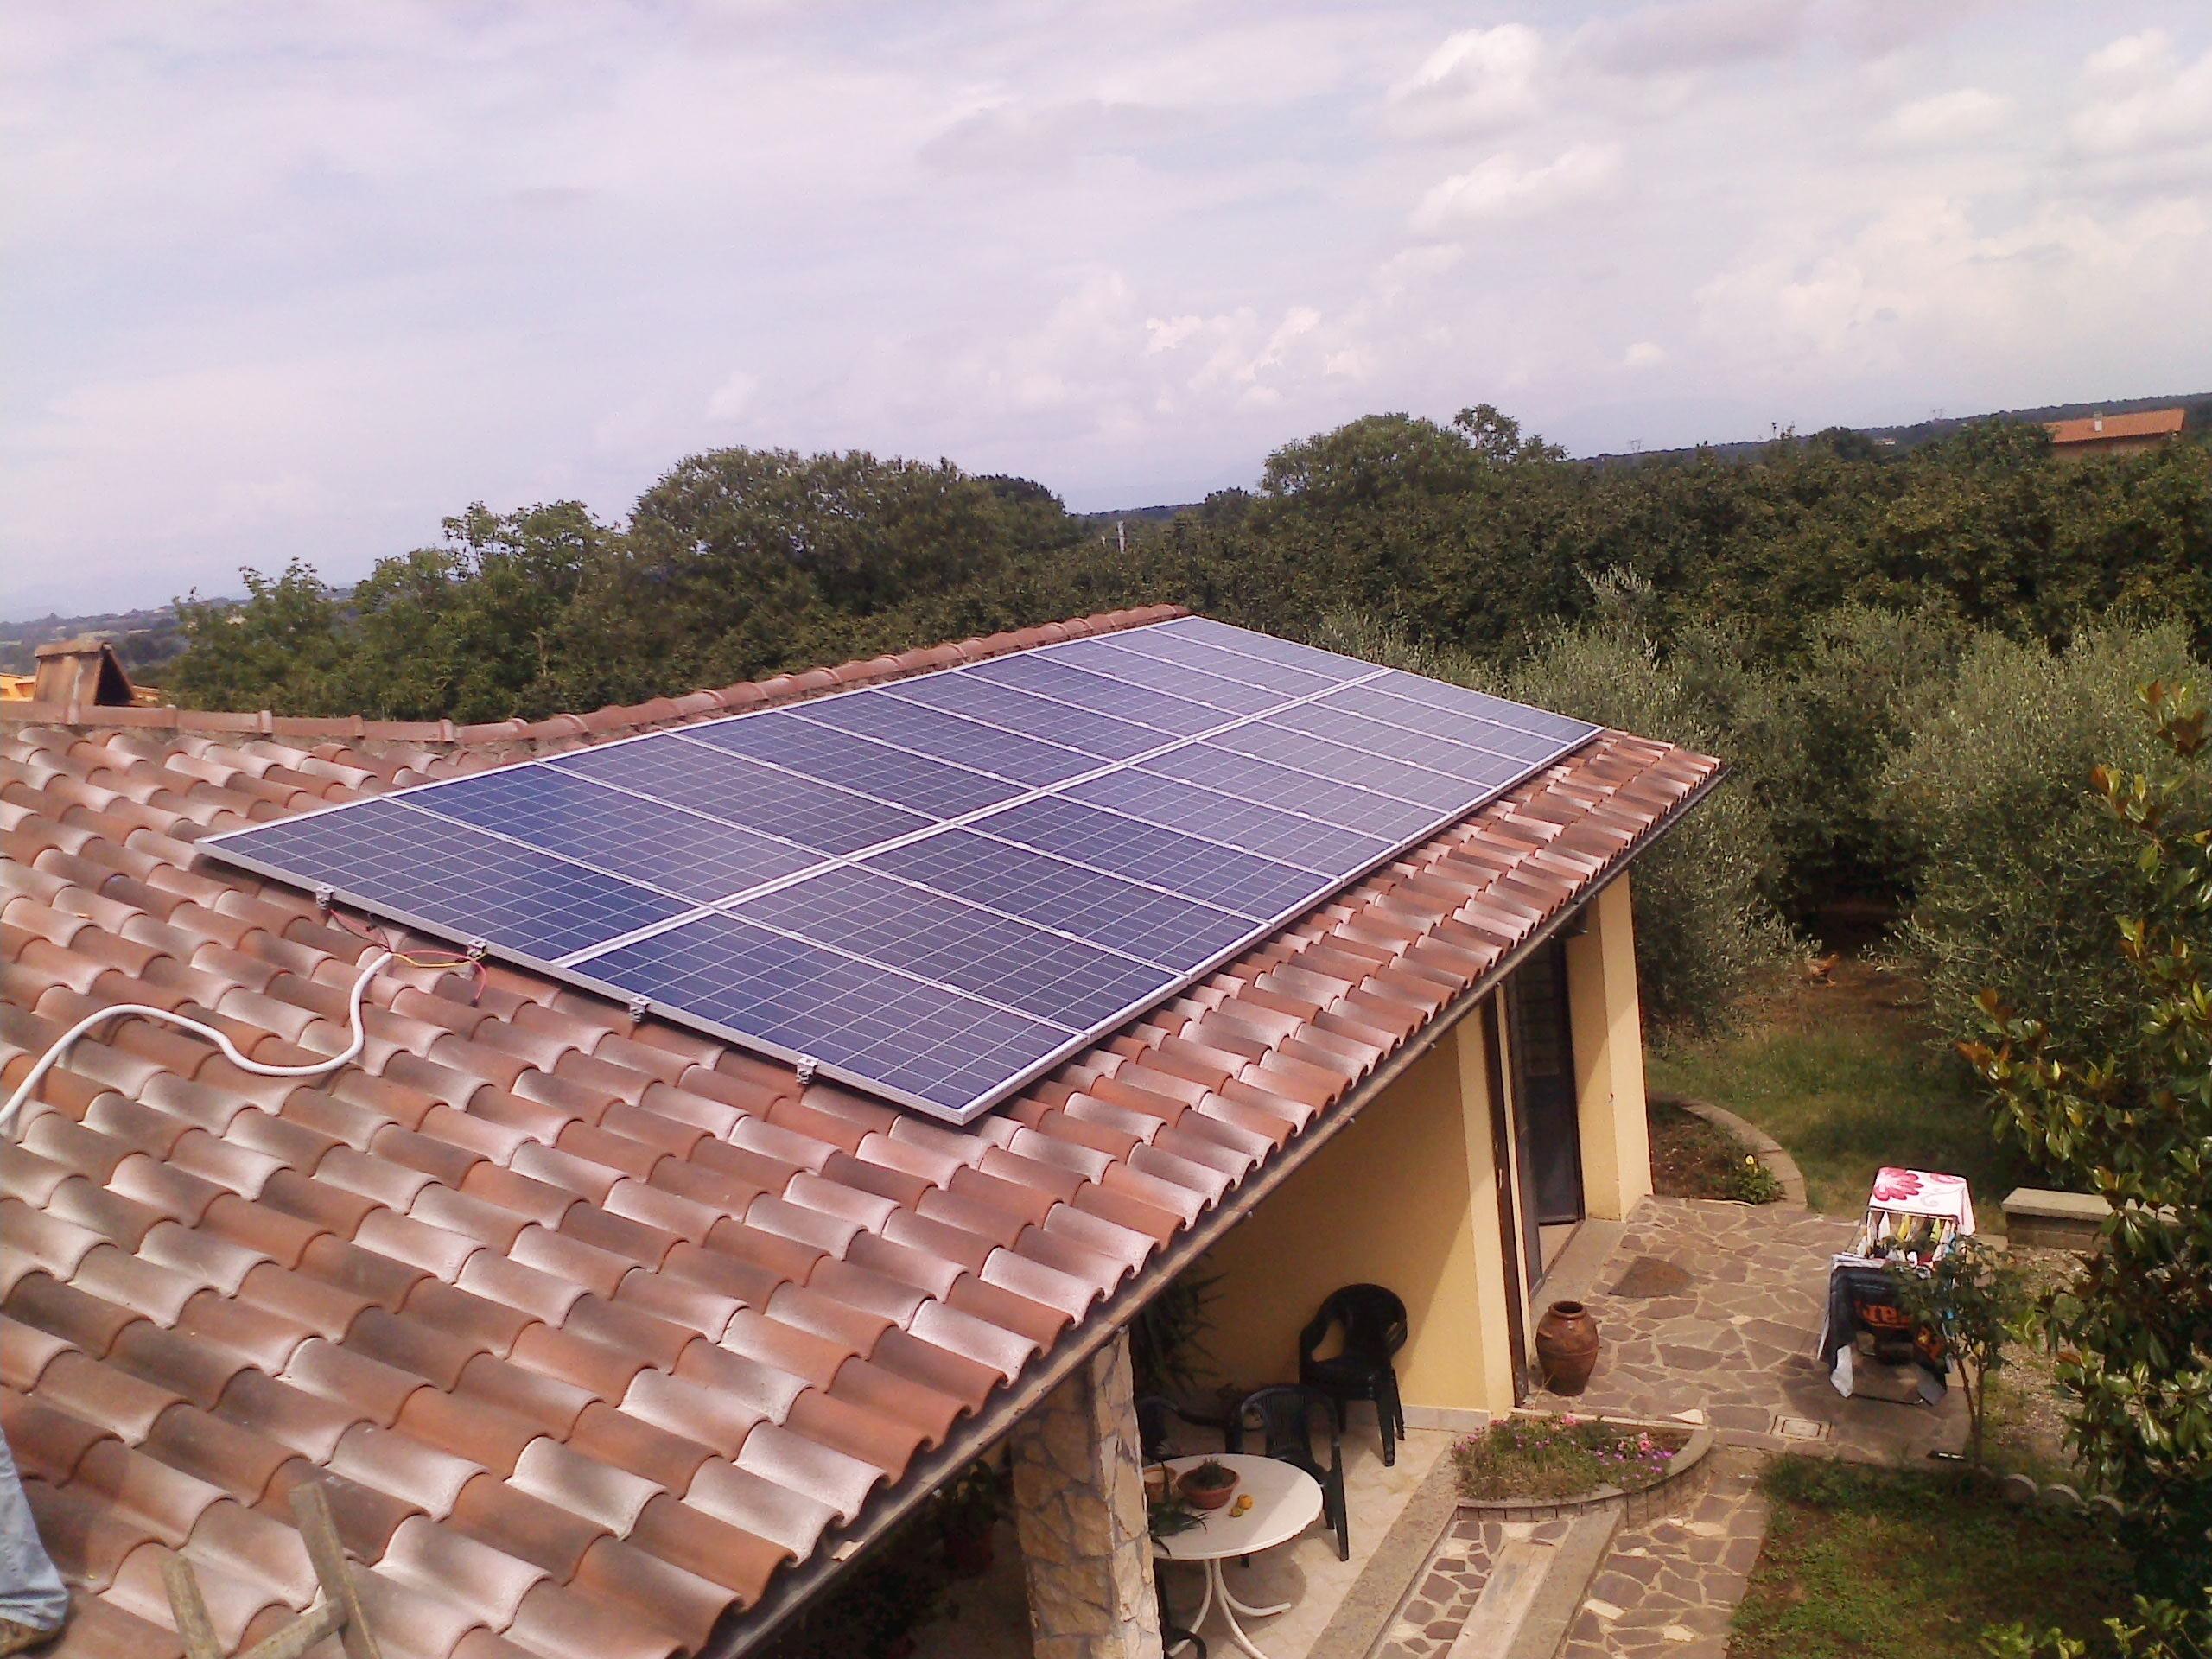 impianto fotovoltaico soriano nel cimino 4,6 kWp